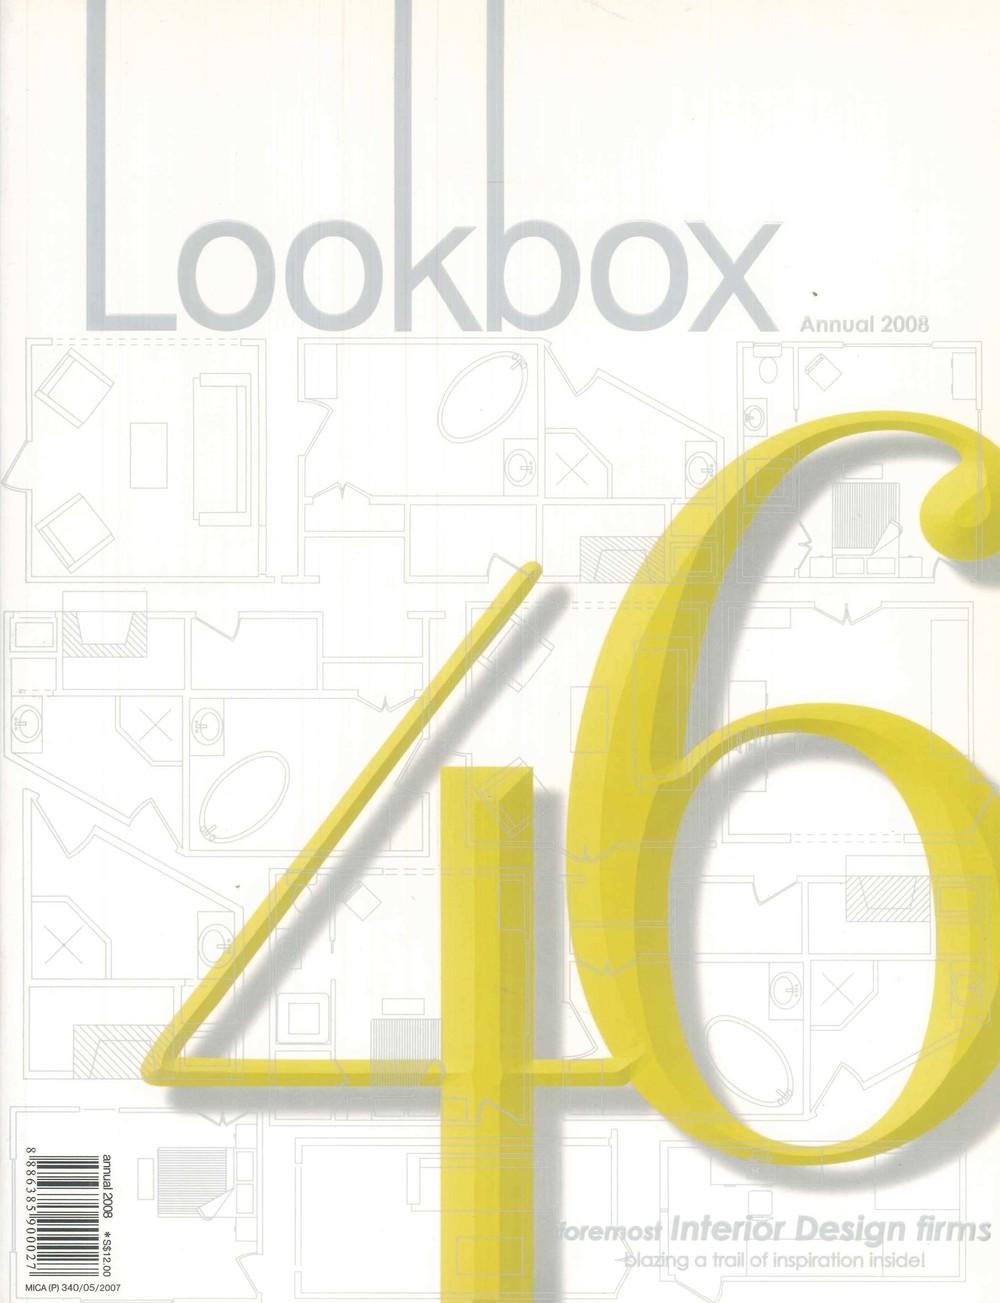 LOOKBOX ANNUAL 2008 COVER.jpg